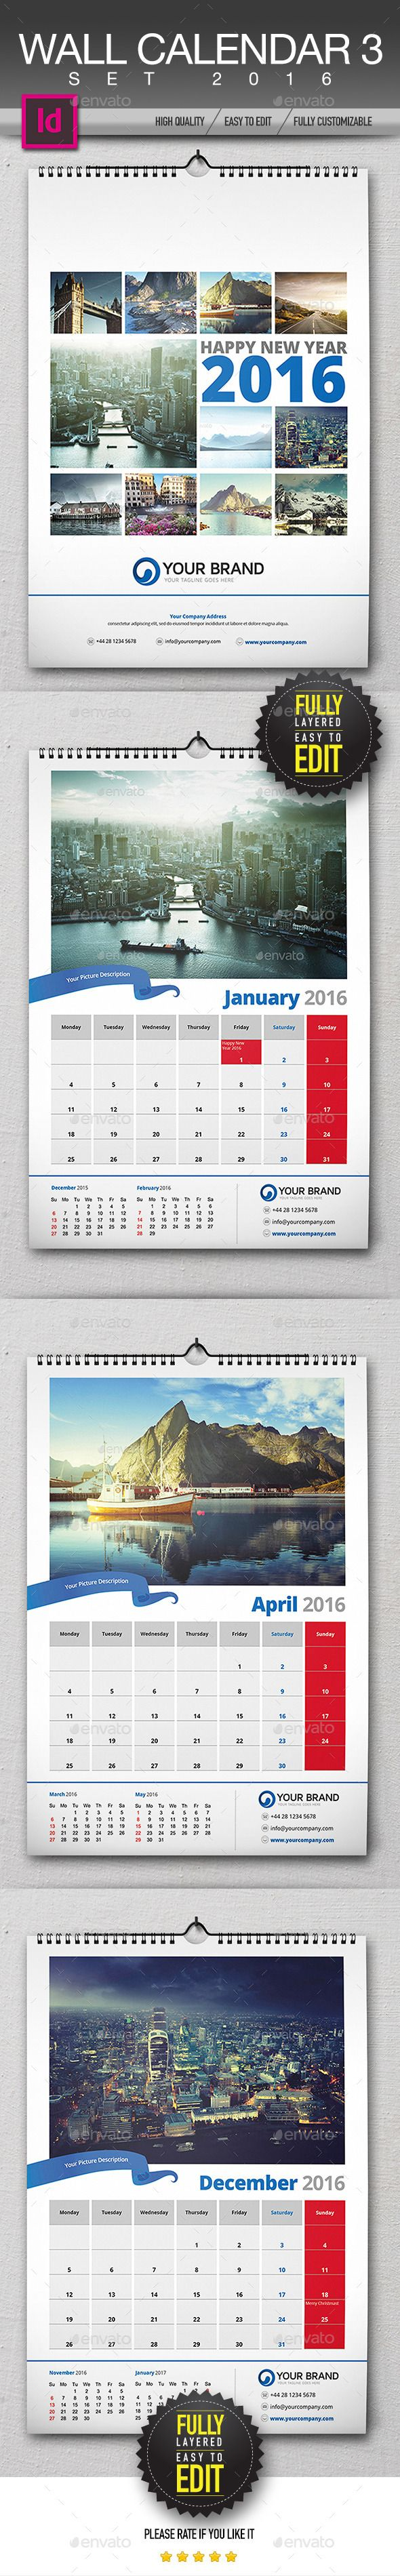 Wall Calendar 2016 Template InDesign INDD #design Download: http://graphicriver.net/item/wall-calendar-2016/13122707?ref=ksioks